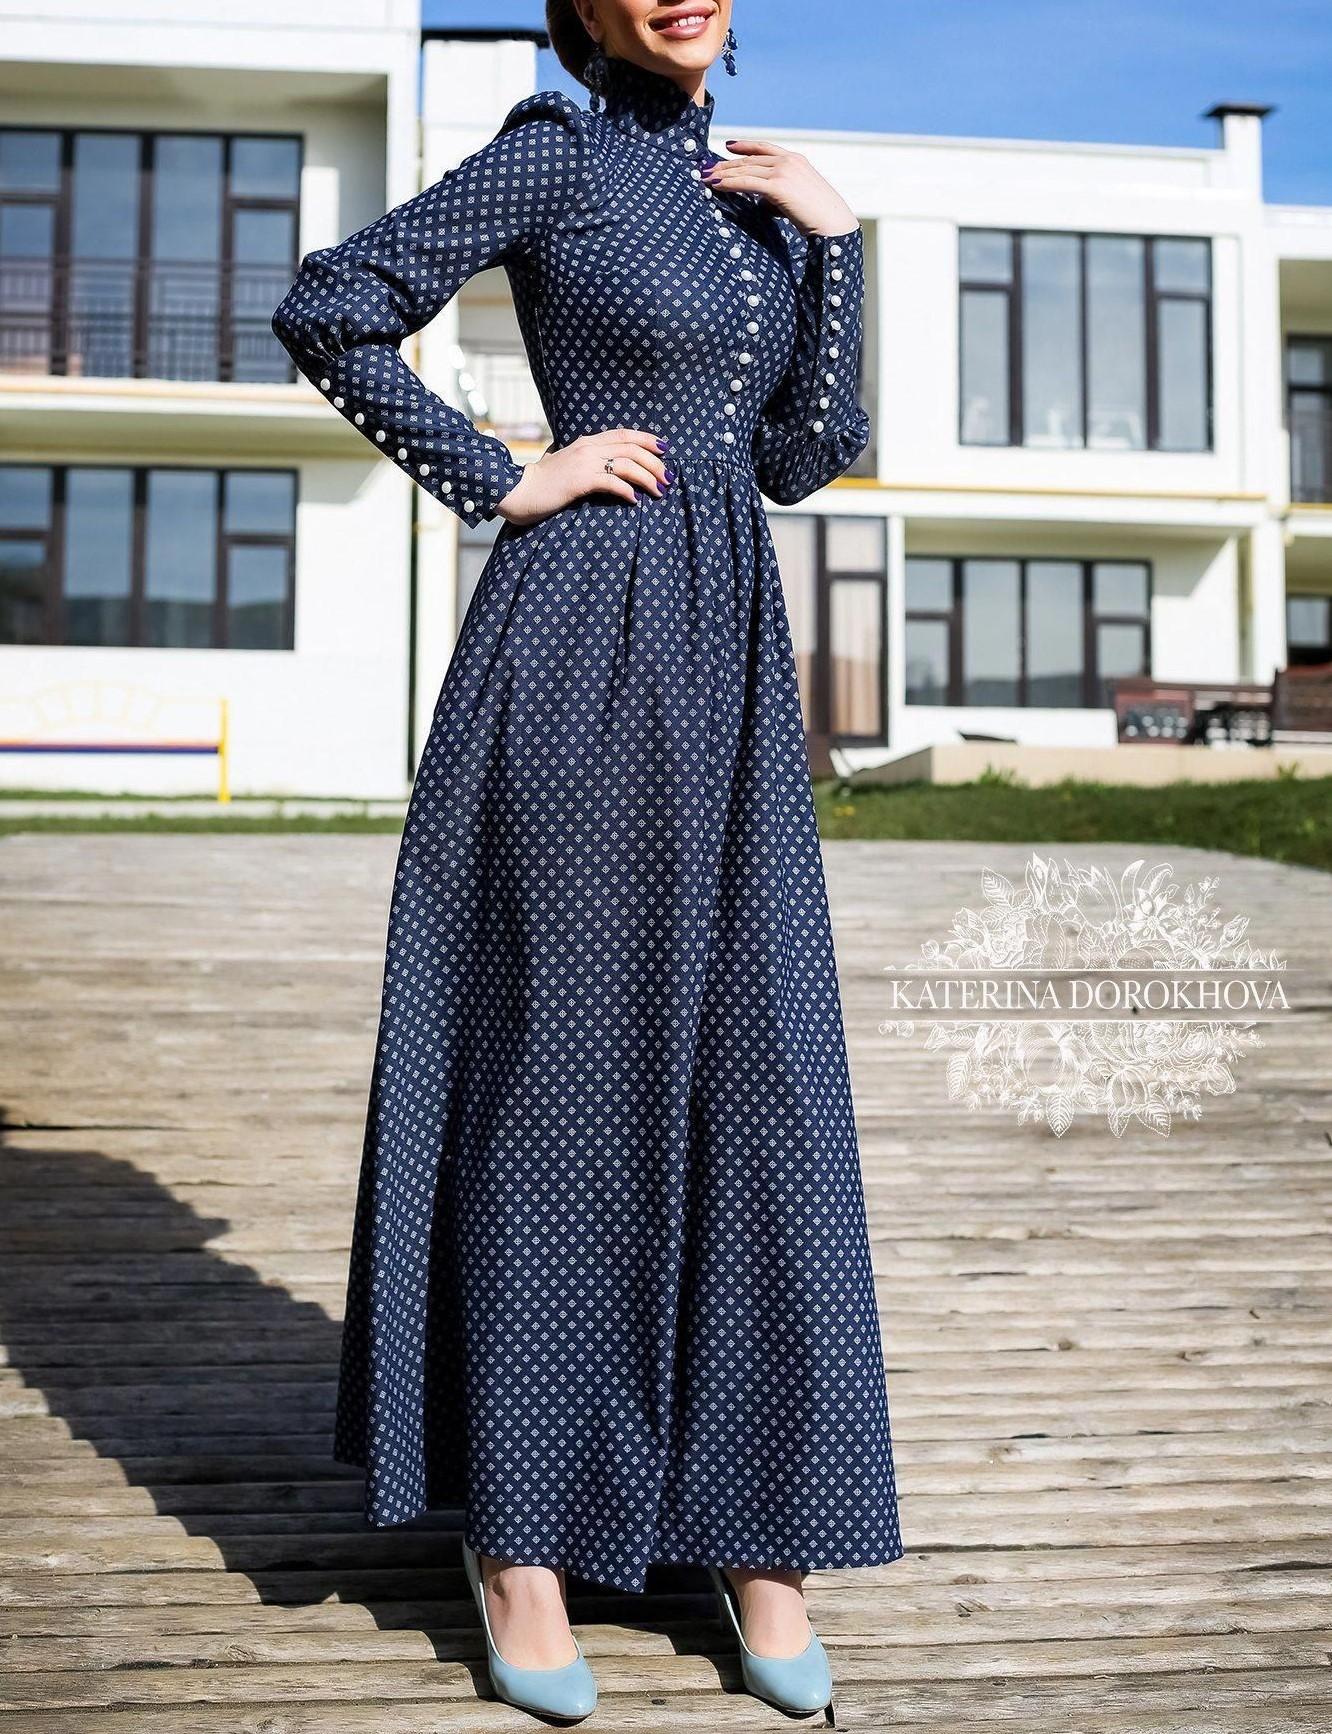 مدل مانتو افغانی تابستانه 2019